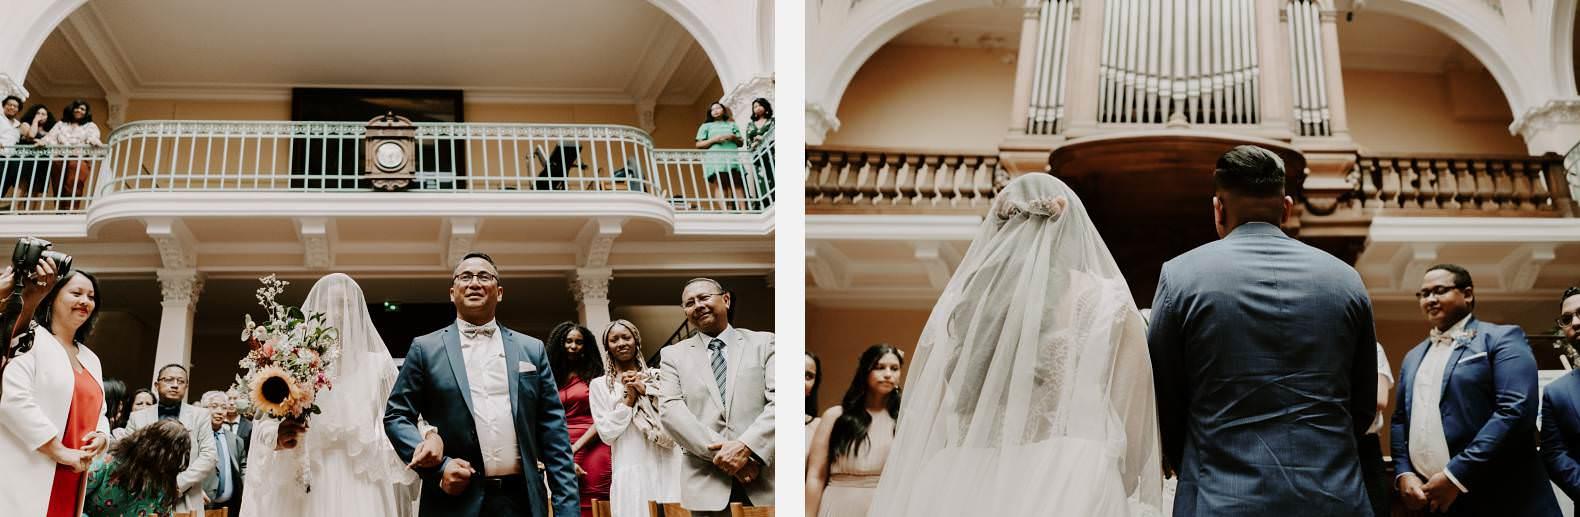 mariage manoir de corny photographe bel esprit 0019 1